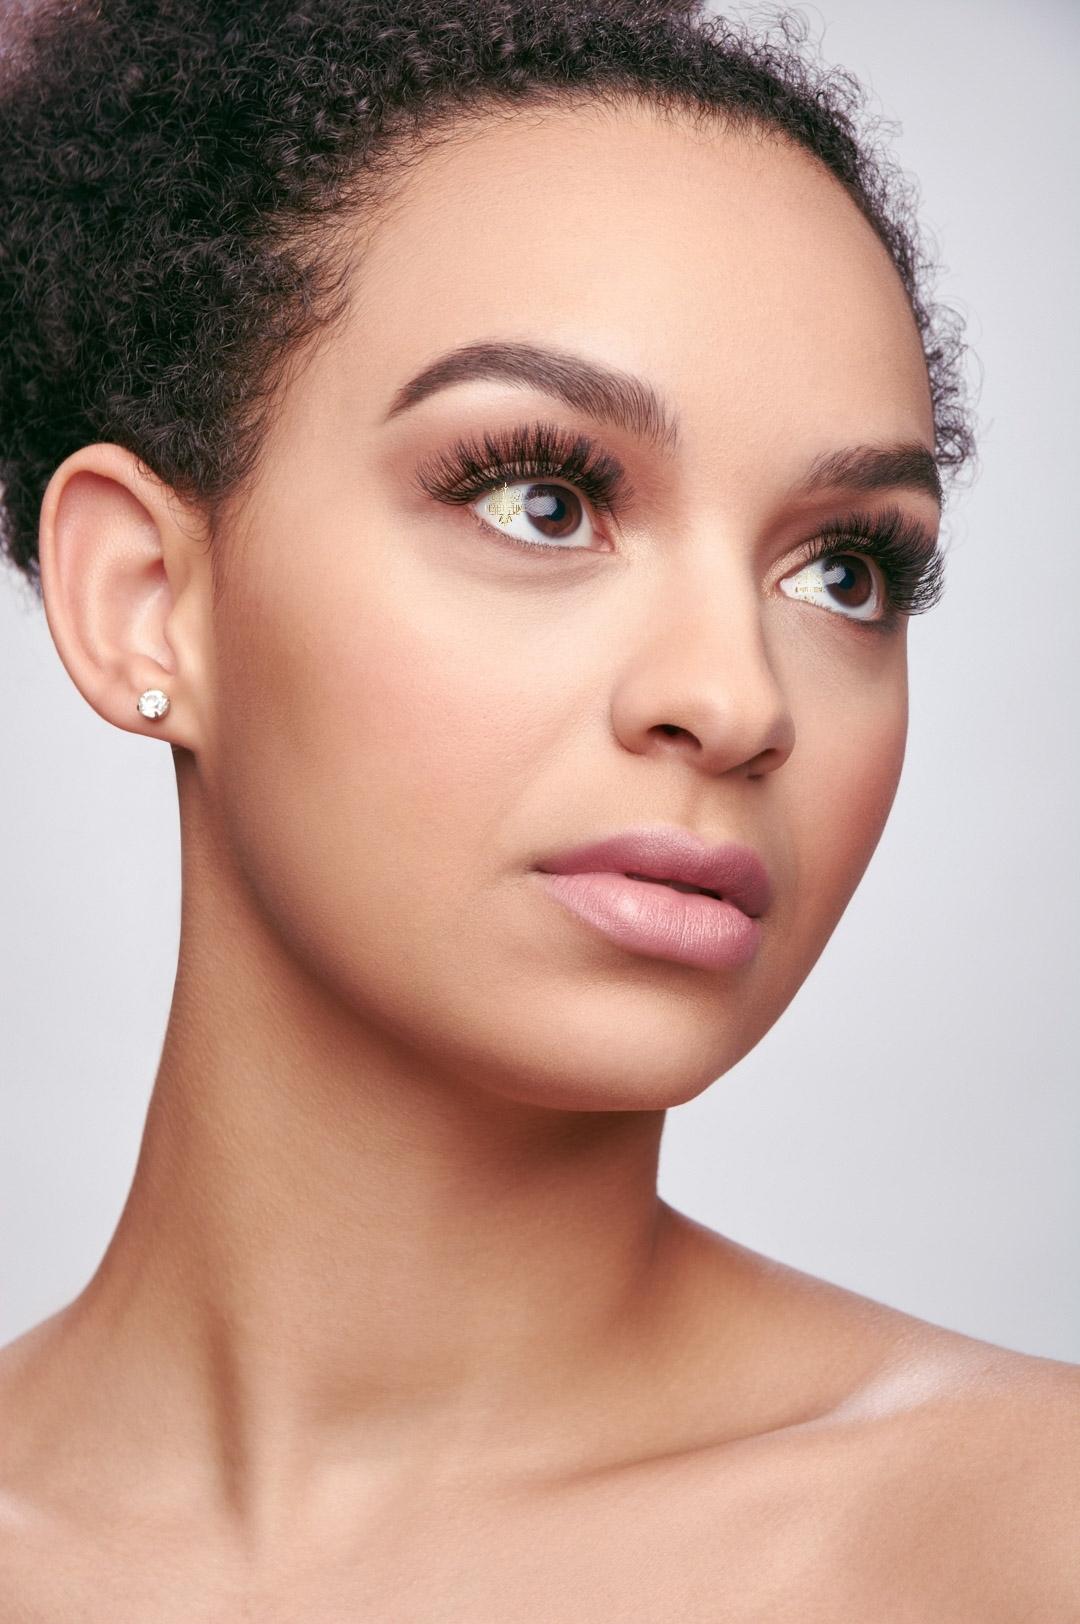 Beauty Time model Tamia Eyelash Extensions